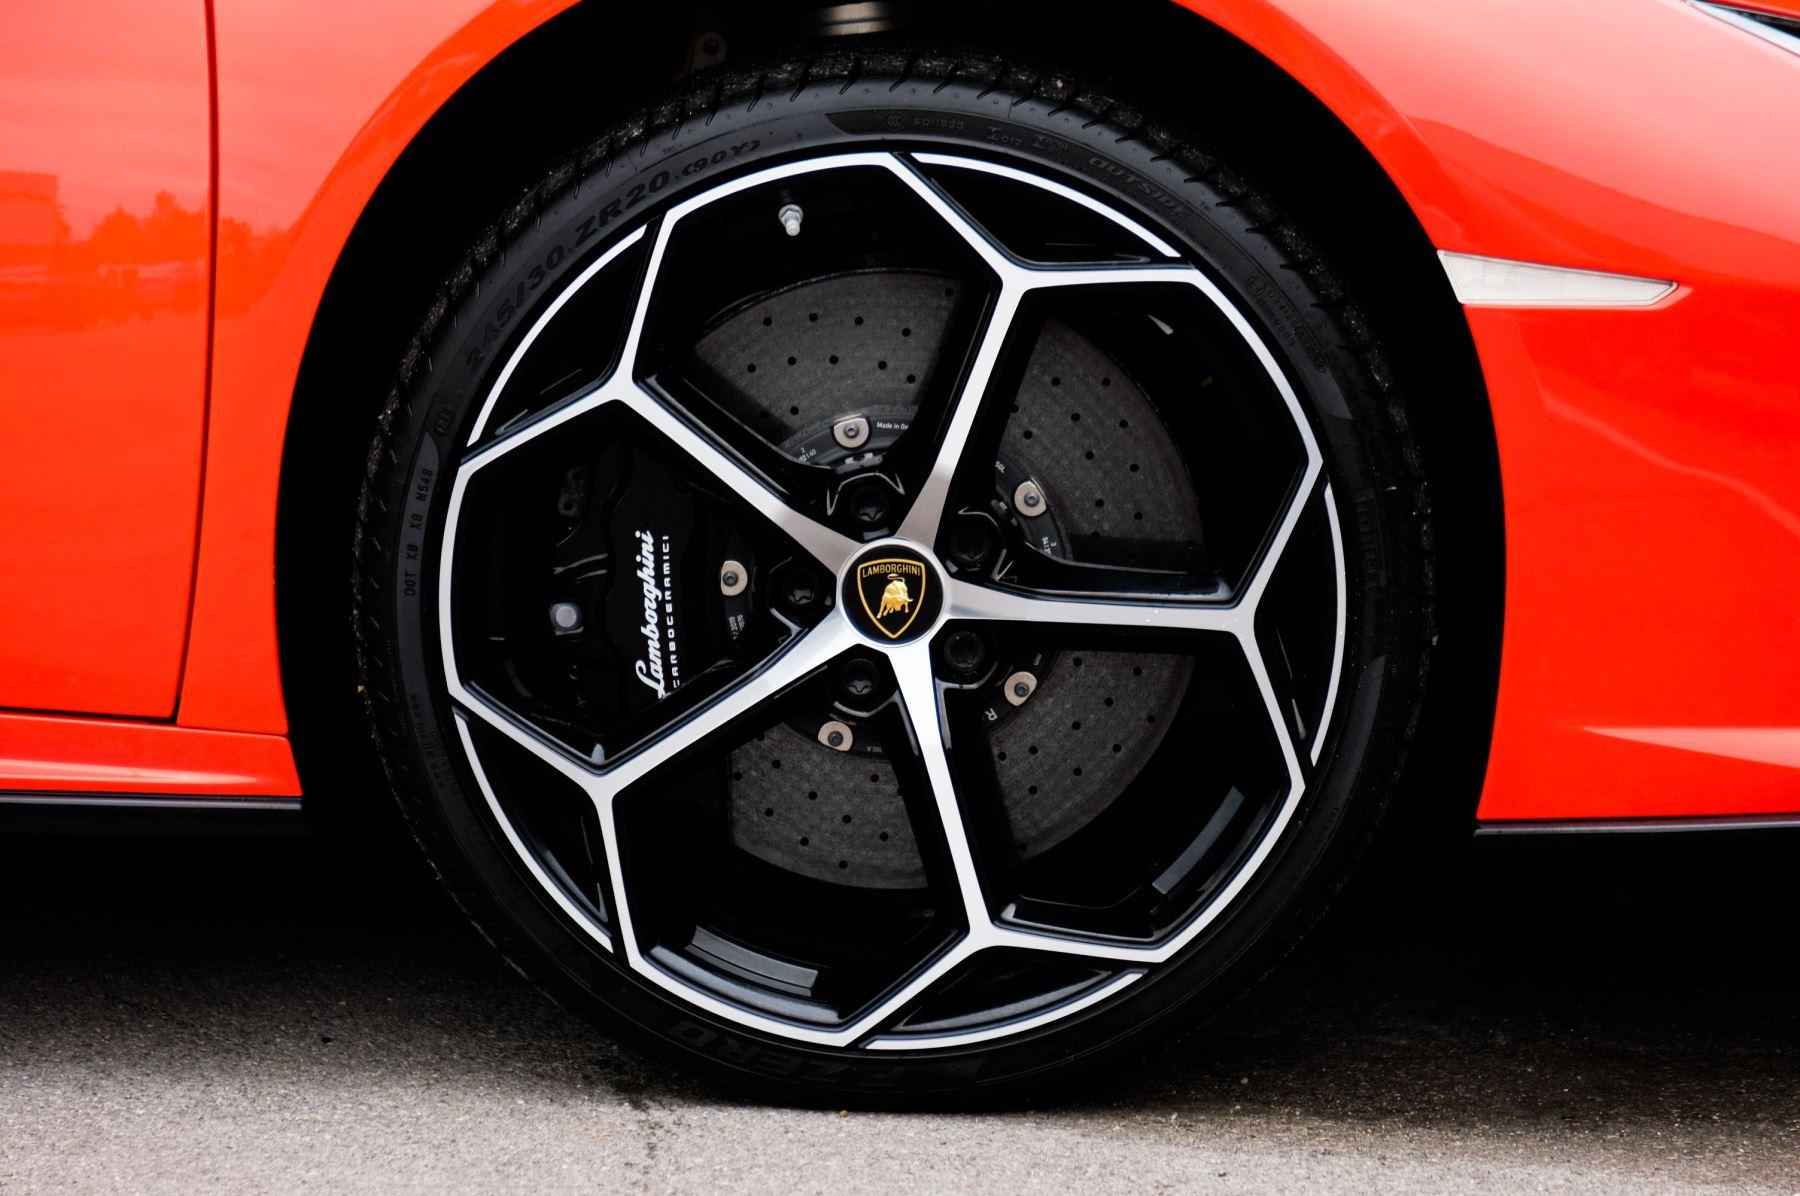 Lamborghini Huracan EVO LP 640-4 LDF image 9